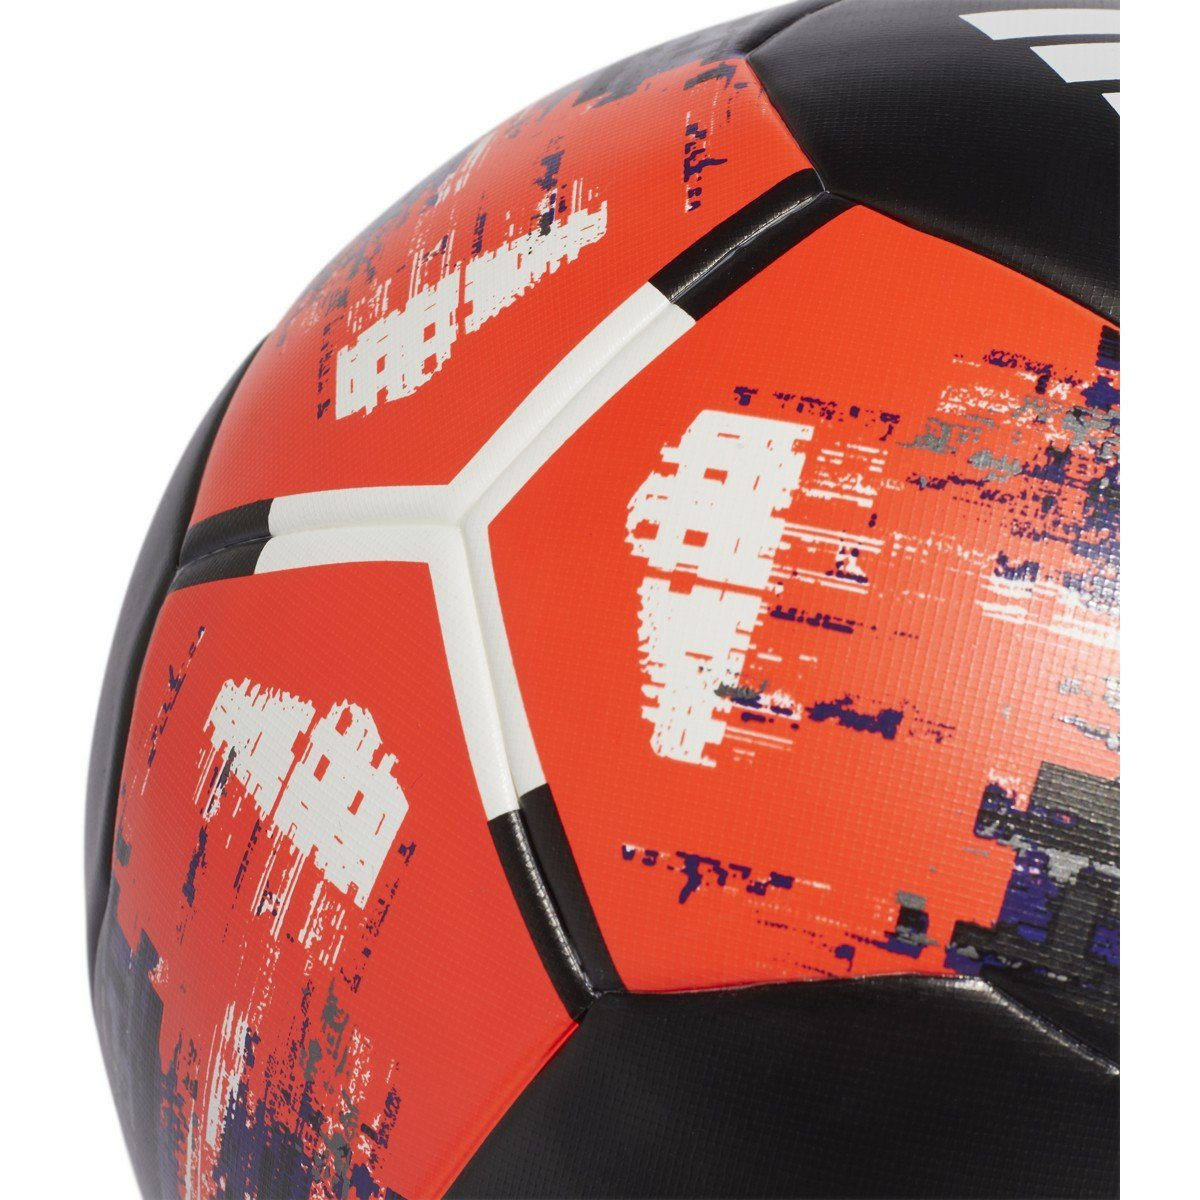 Un pan femenino Seguro  adidas Team Top Replique Soccer Ball - Walmart.com - Walmart.com